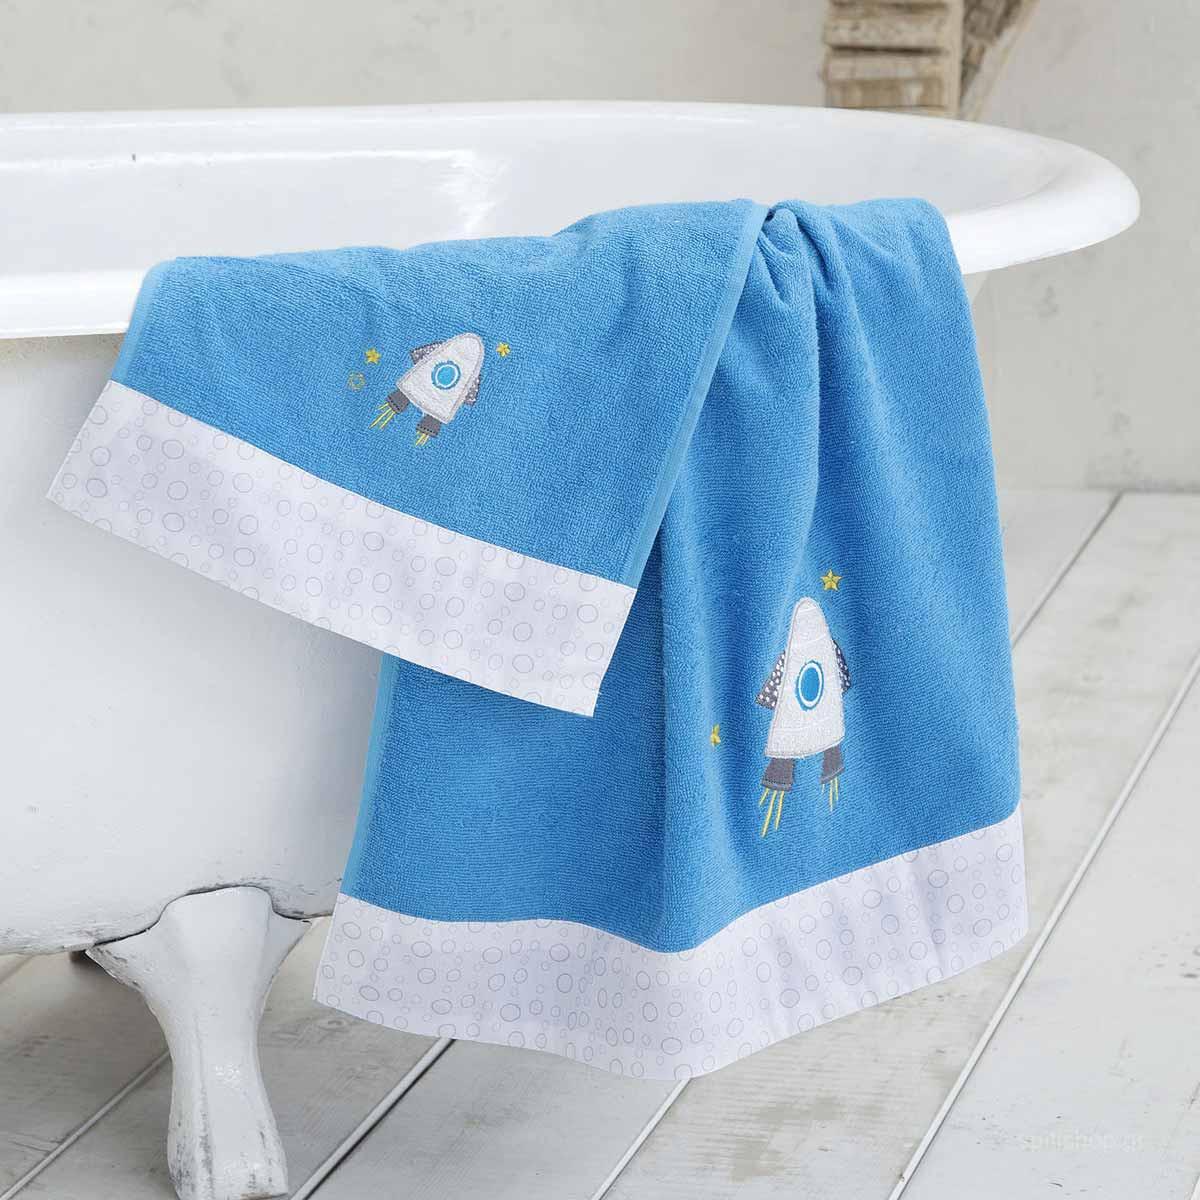 9665bb43902 -10% Spiti Shop Παιδικές Πετσέτες (Σετ 3τμχ) Nima Kids Fleeky